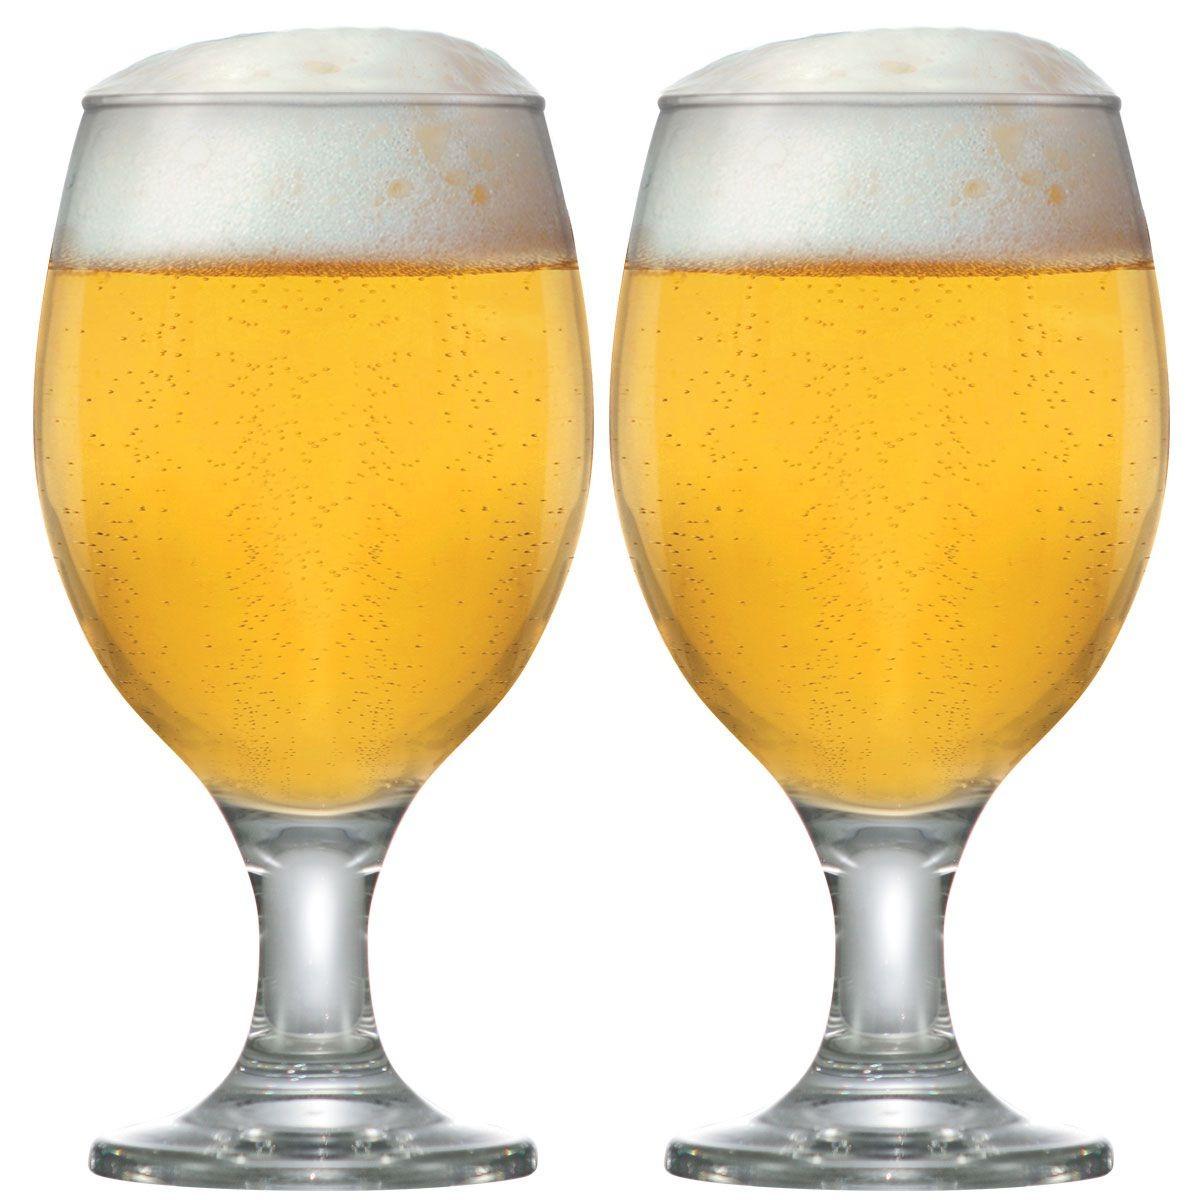 7c1180033 Jogo Copos Taças Cerveja Vidro Conjunto Roma 400ml Kit 2 Pcs - R$ 27 ...